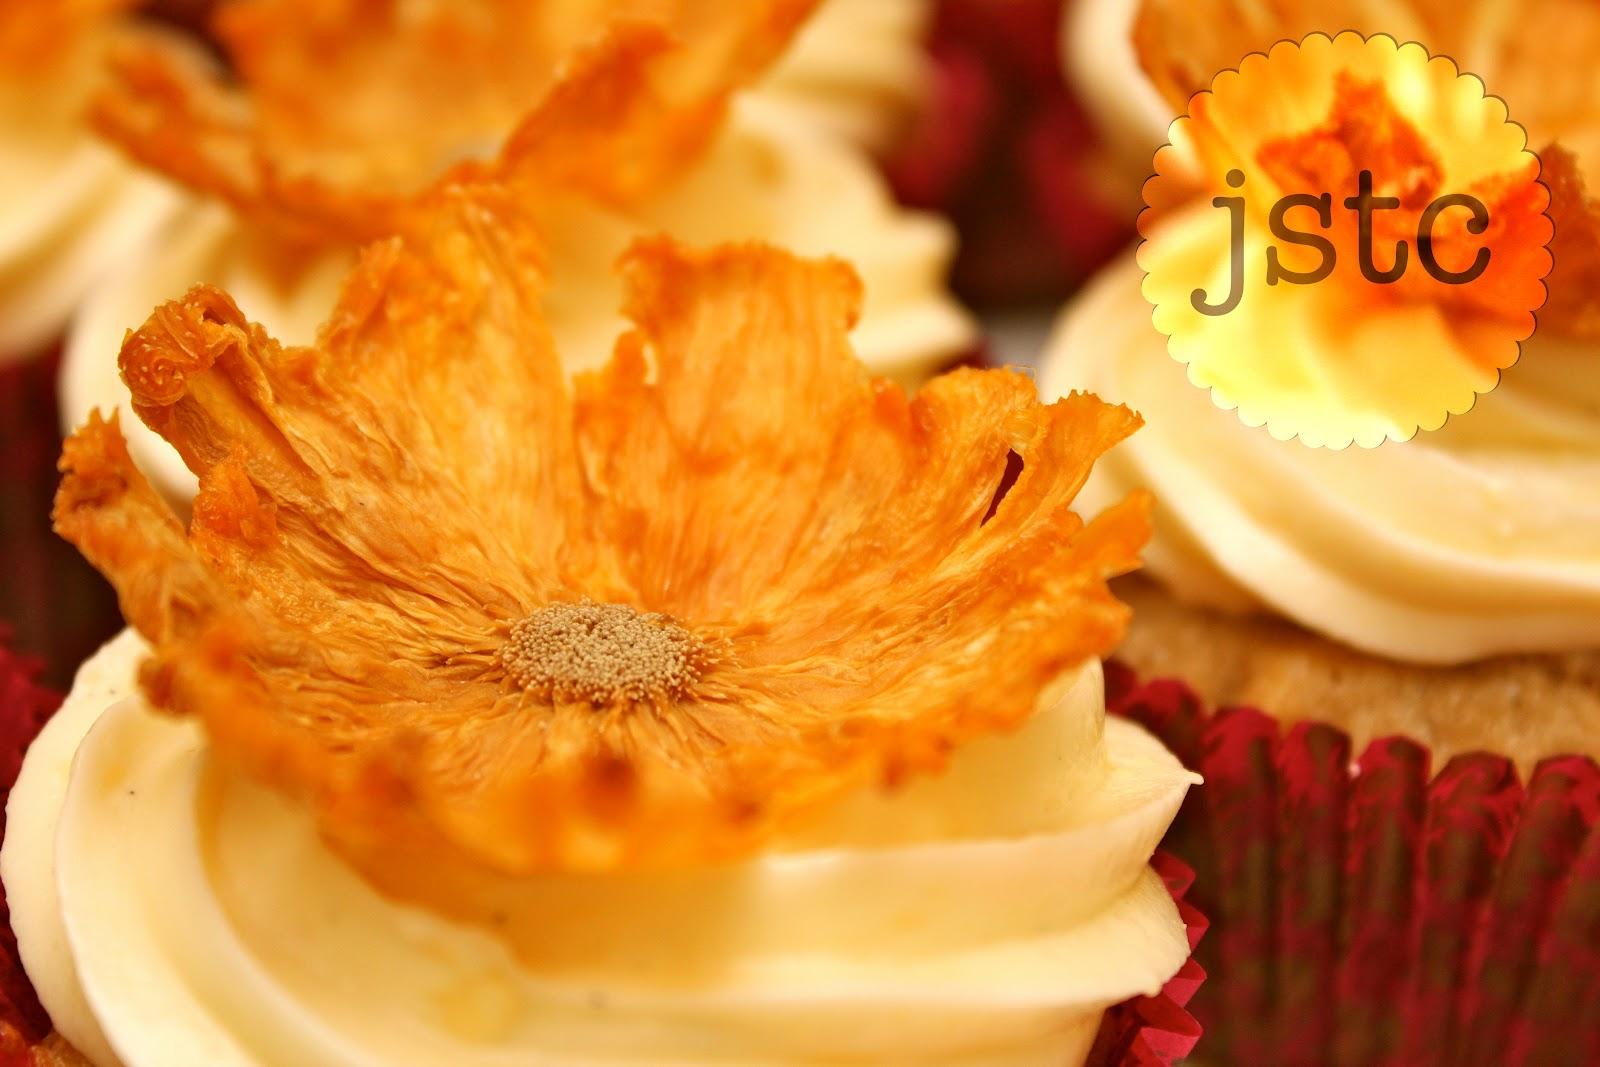 Jemma's Sweet Treat Catering: Dried Pineapple Flowers